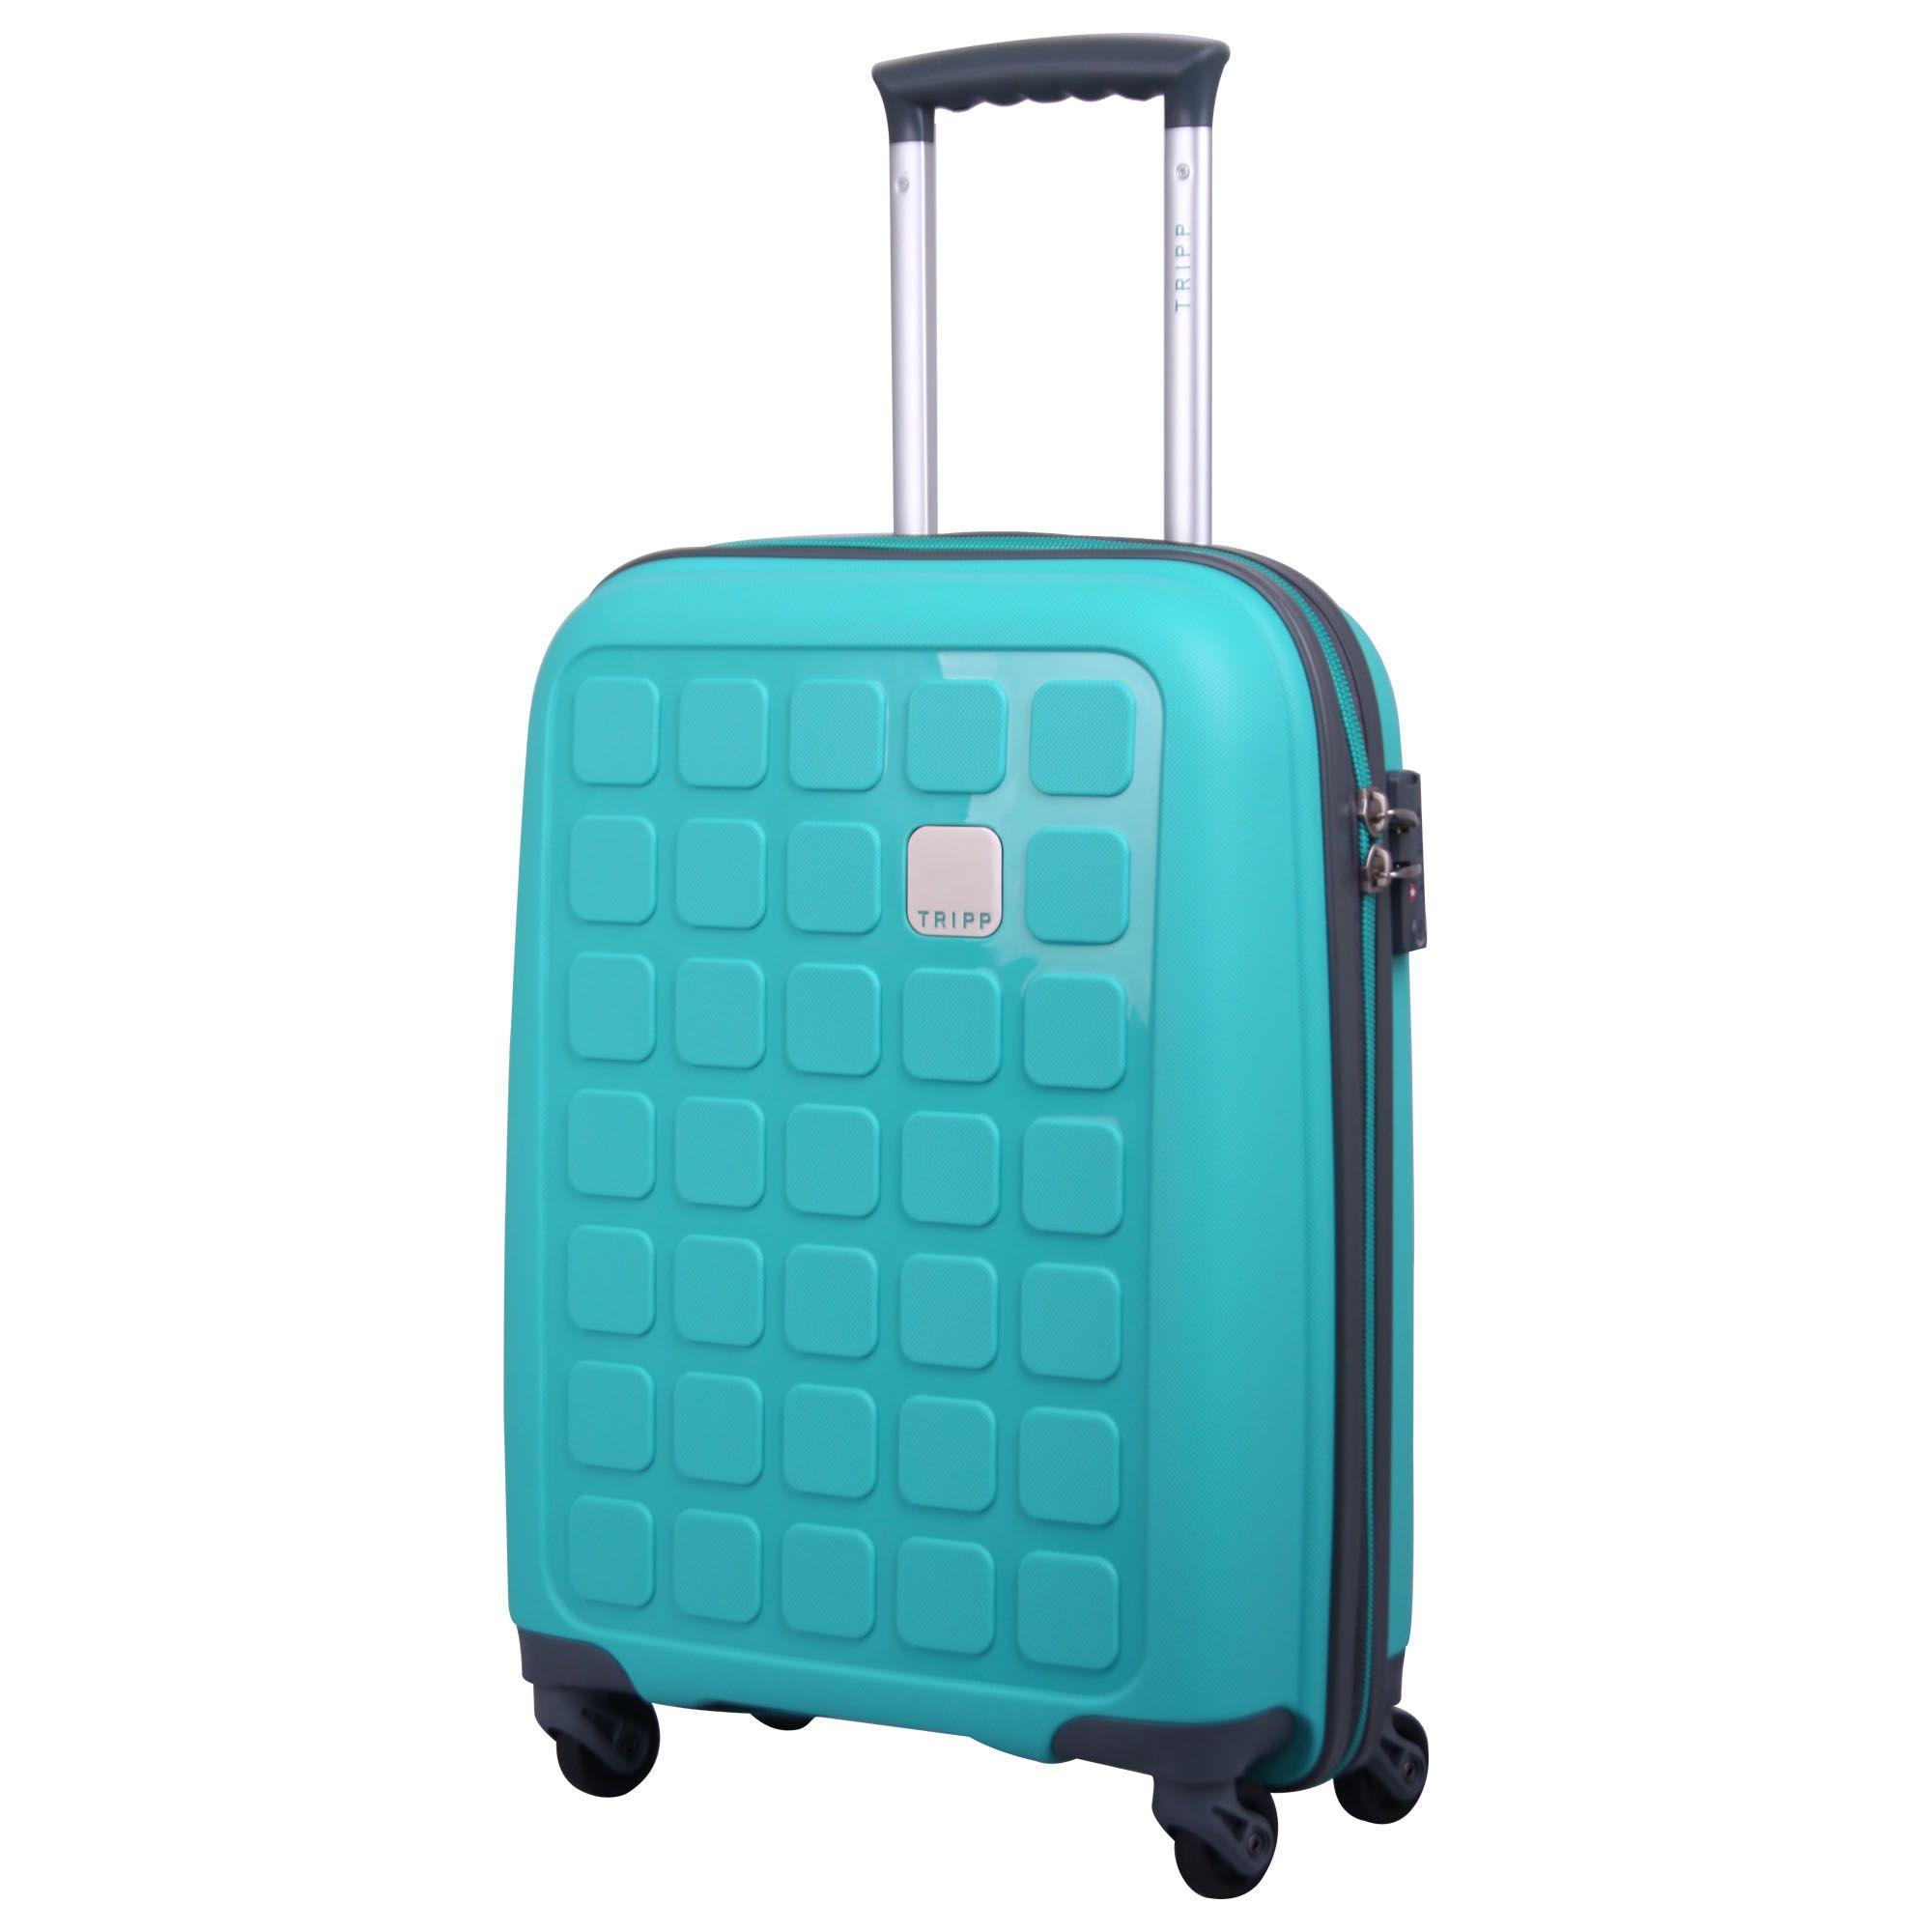 Tripp citron II 'Holiday 5' cabin 4 wheel suitcase - Hard ...